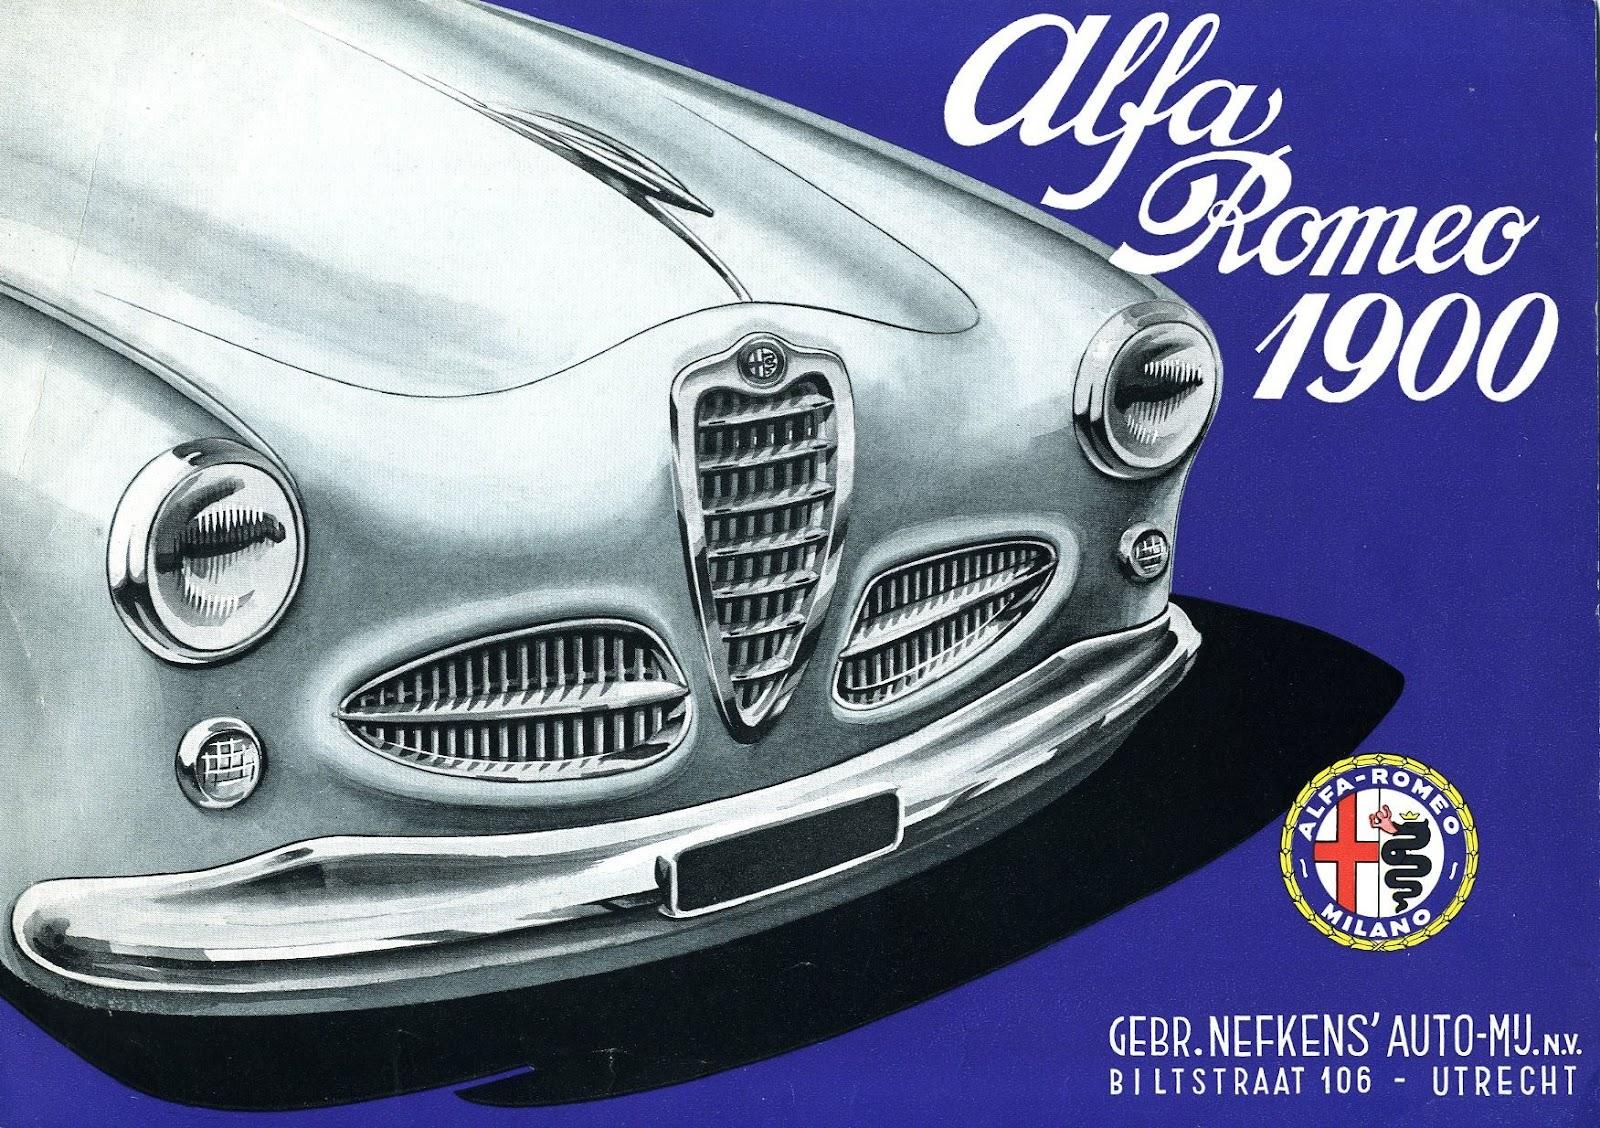 1955-1958-Alfa-Romeo-1900-011.jpg